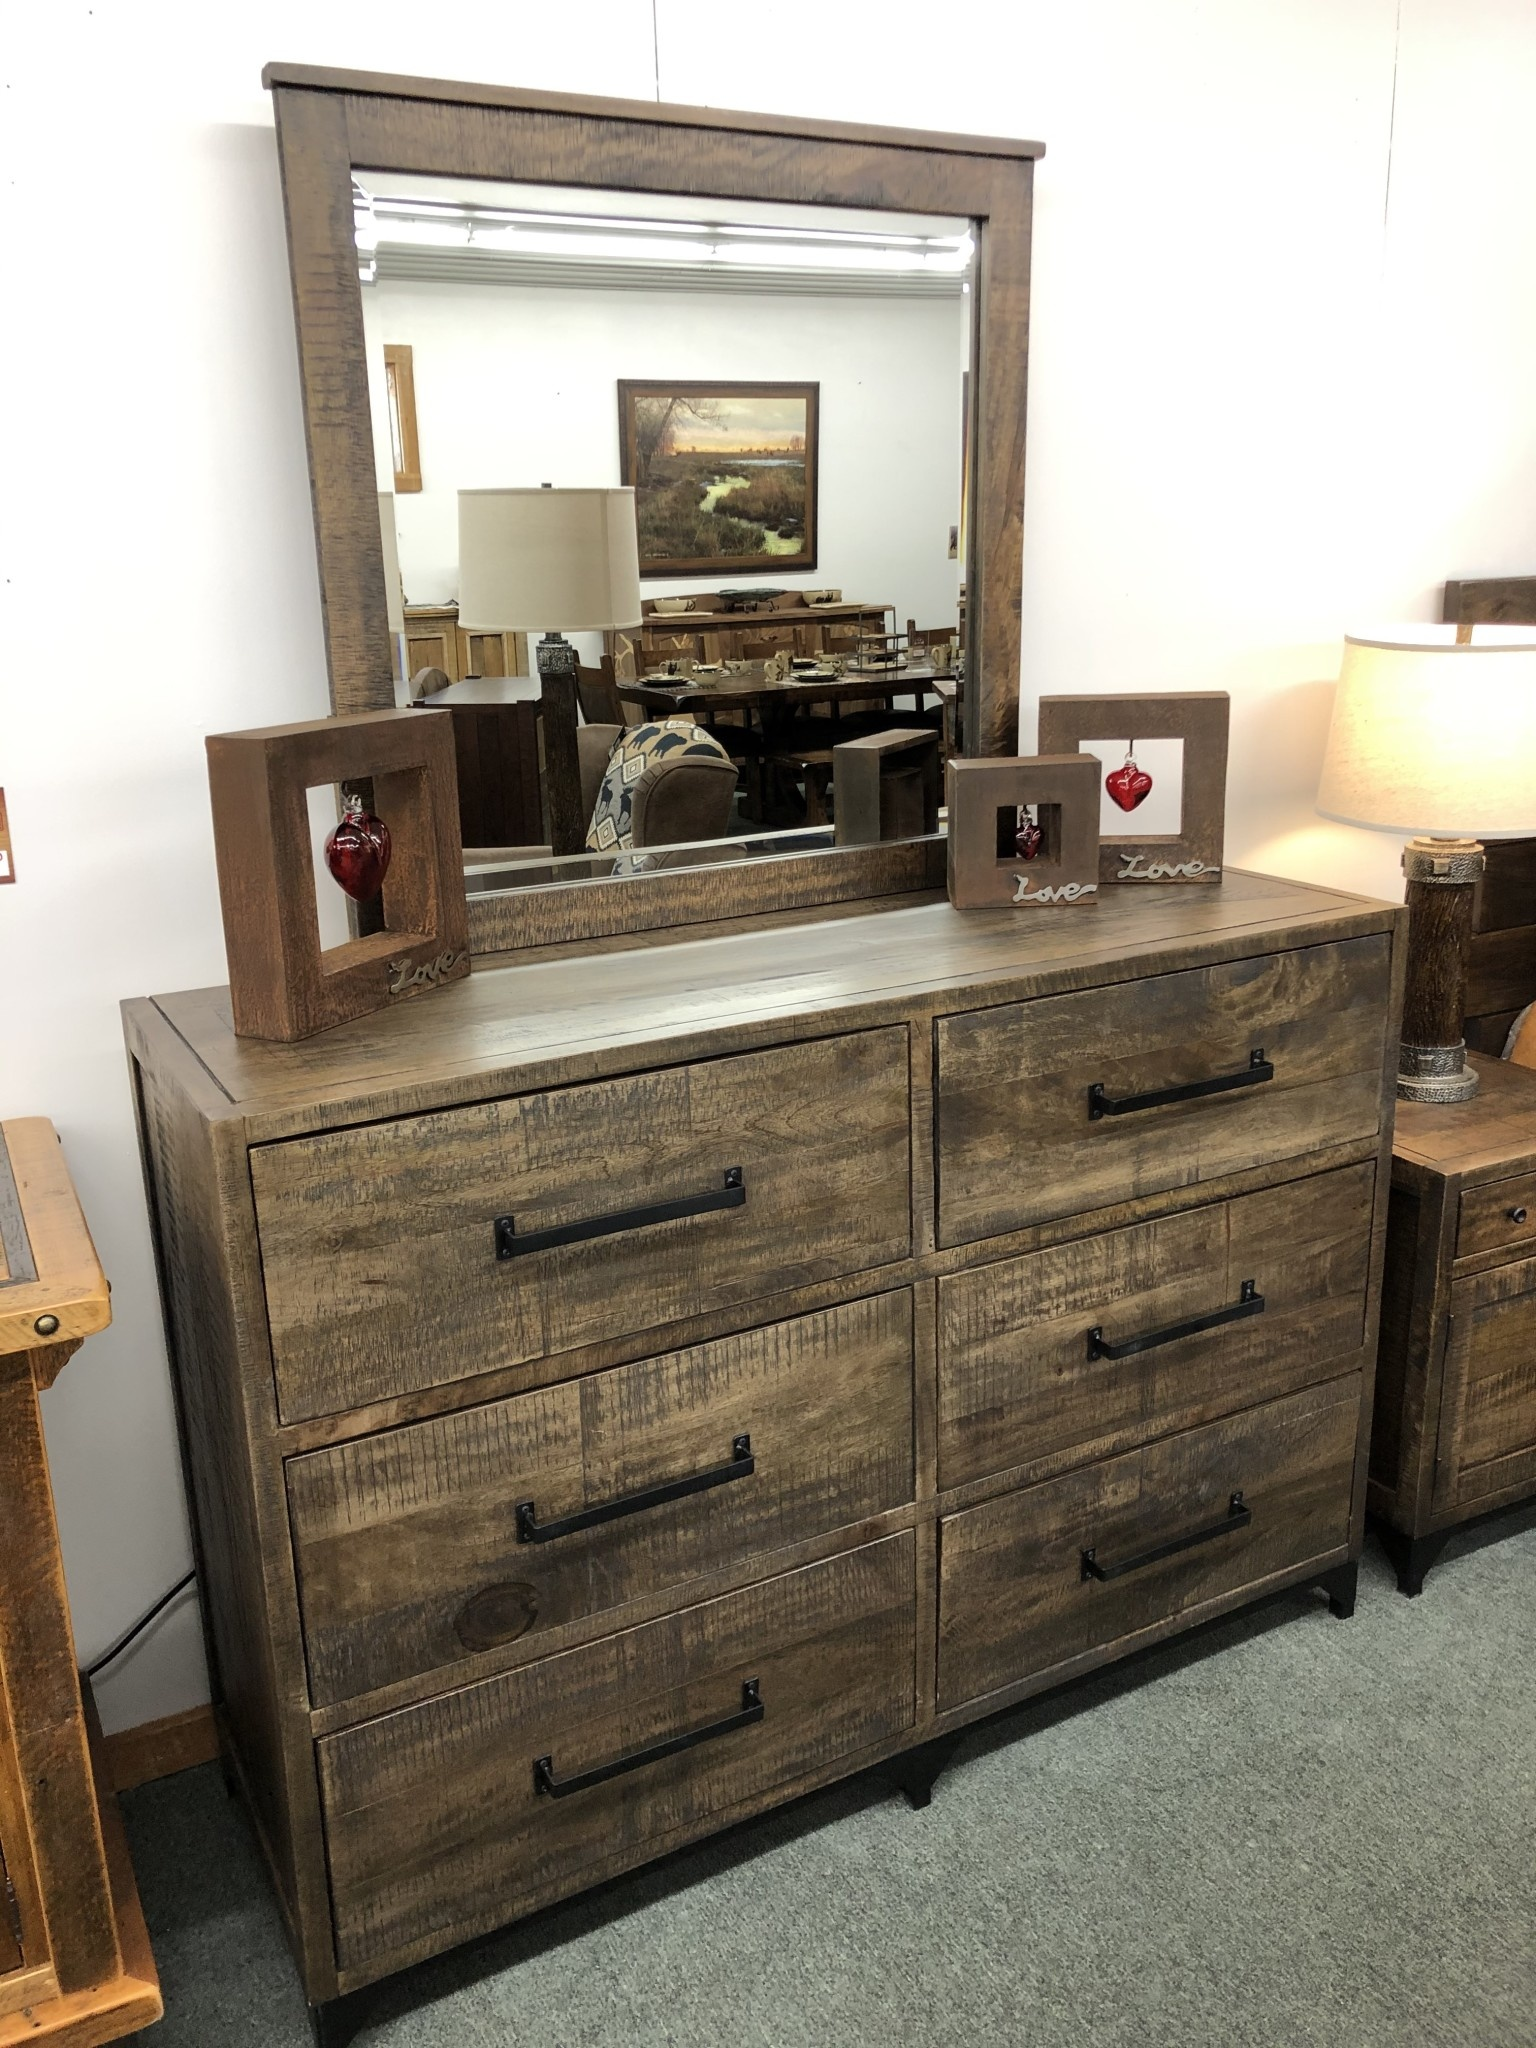 IFD 5201- 6 Drawer Dresser